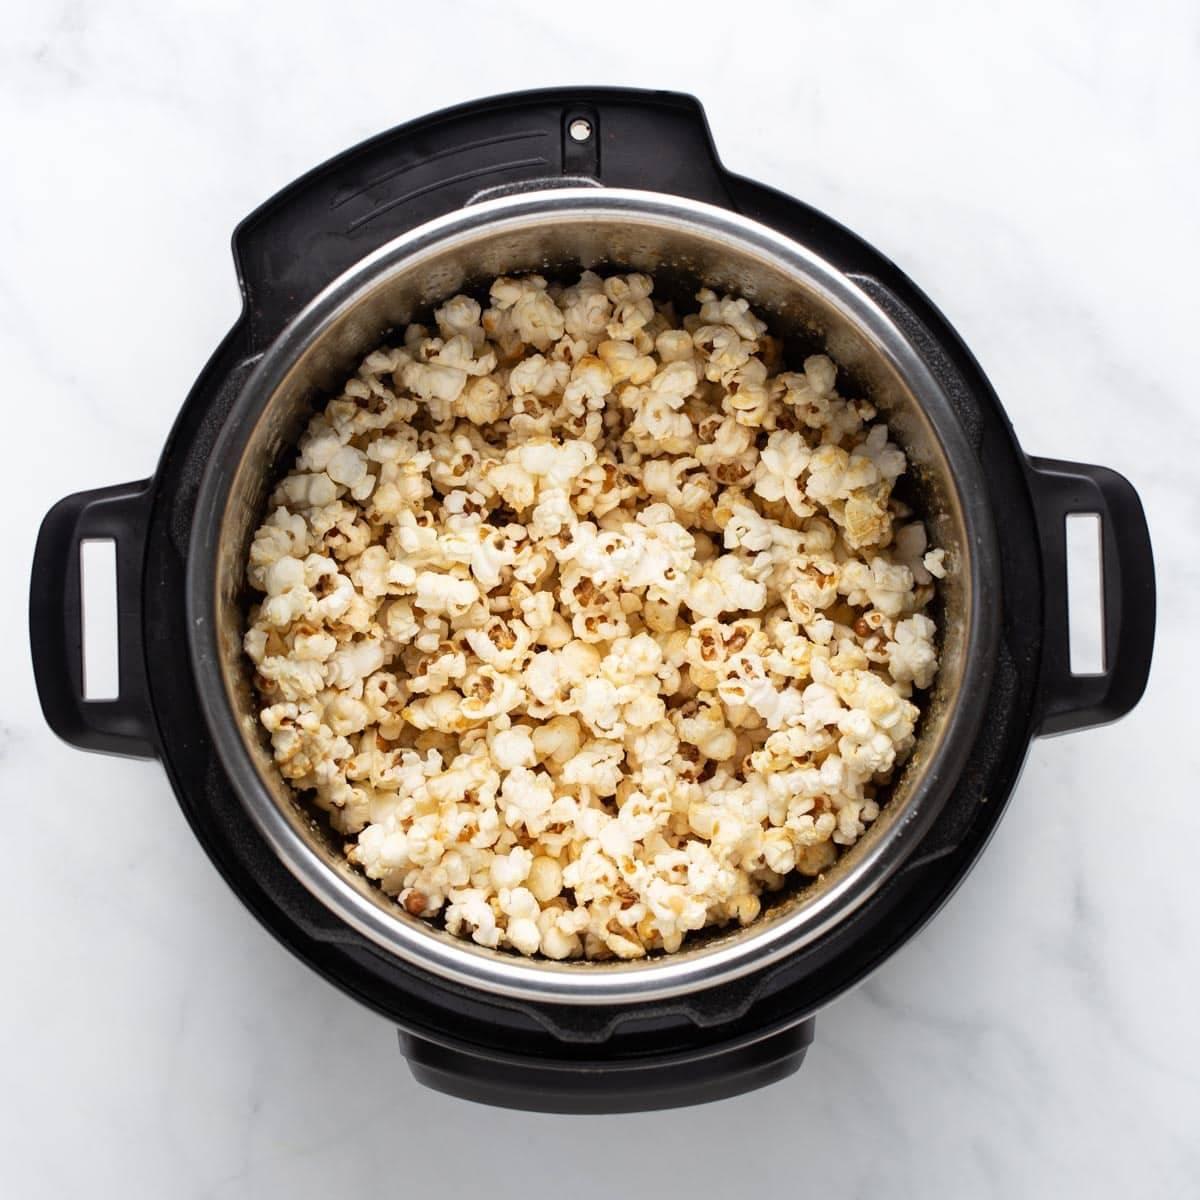 Popcorn in the Instant Pot.